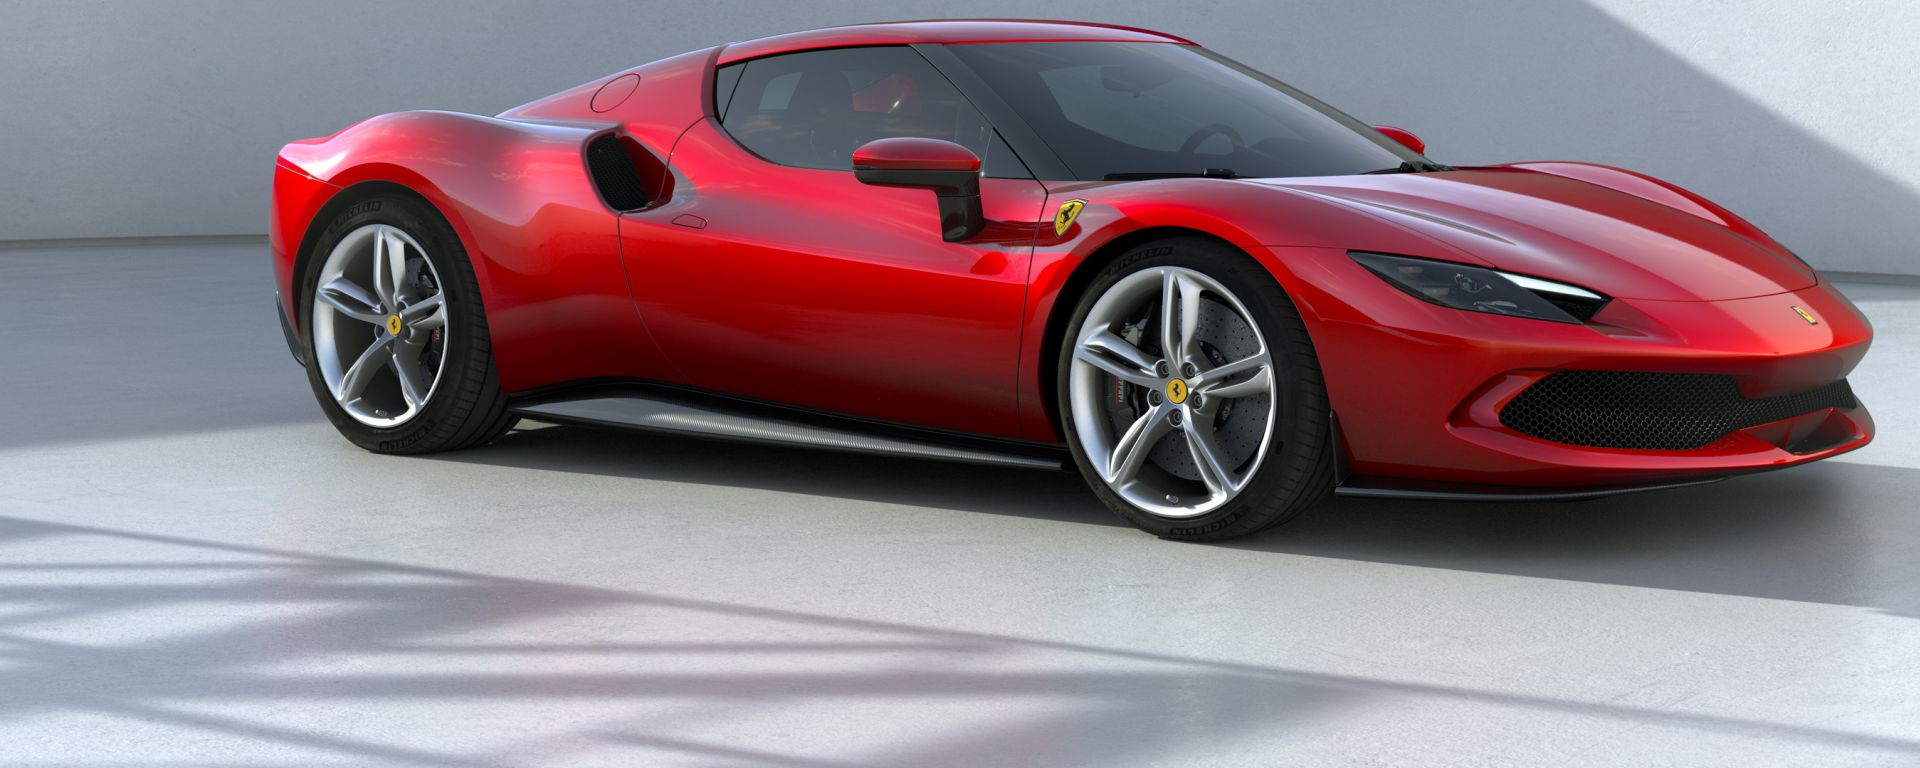 Nuova Ferrari 296 GTB, anteprima al Motor Valley Fest 2021